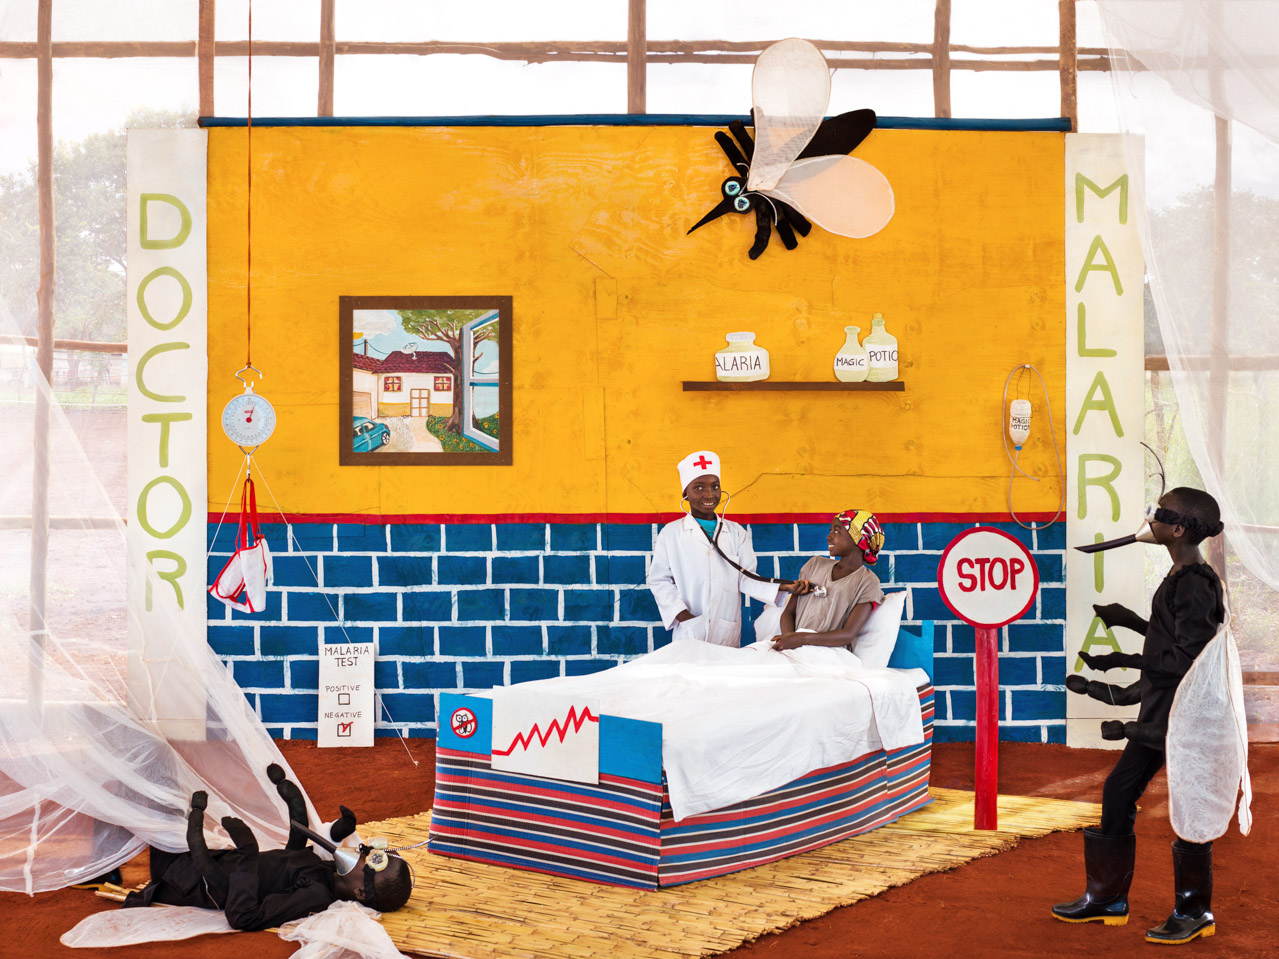 'Doctor Malaria' – Tanzania.